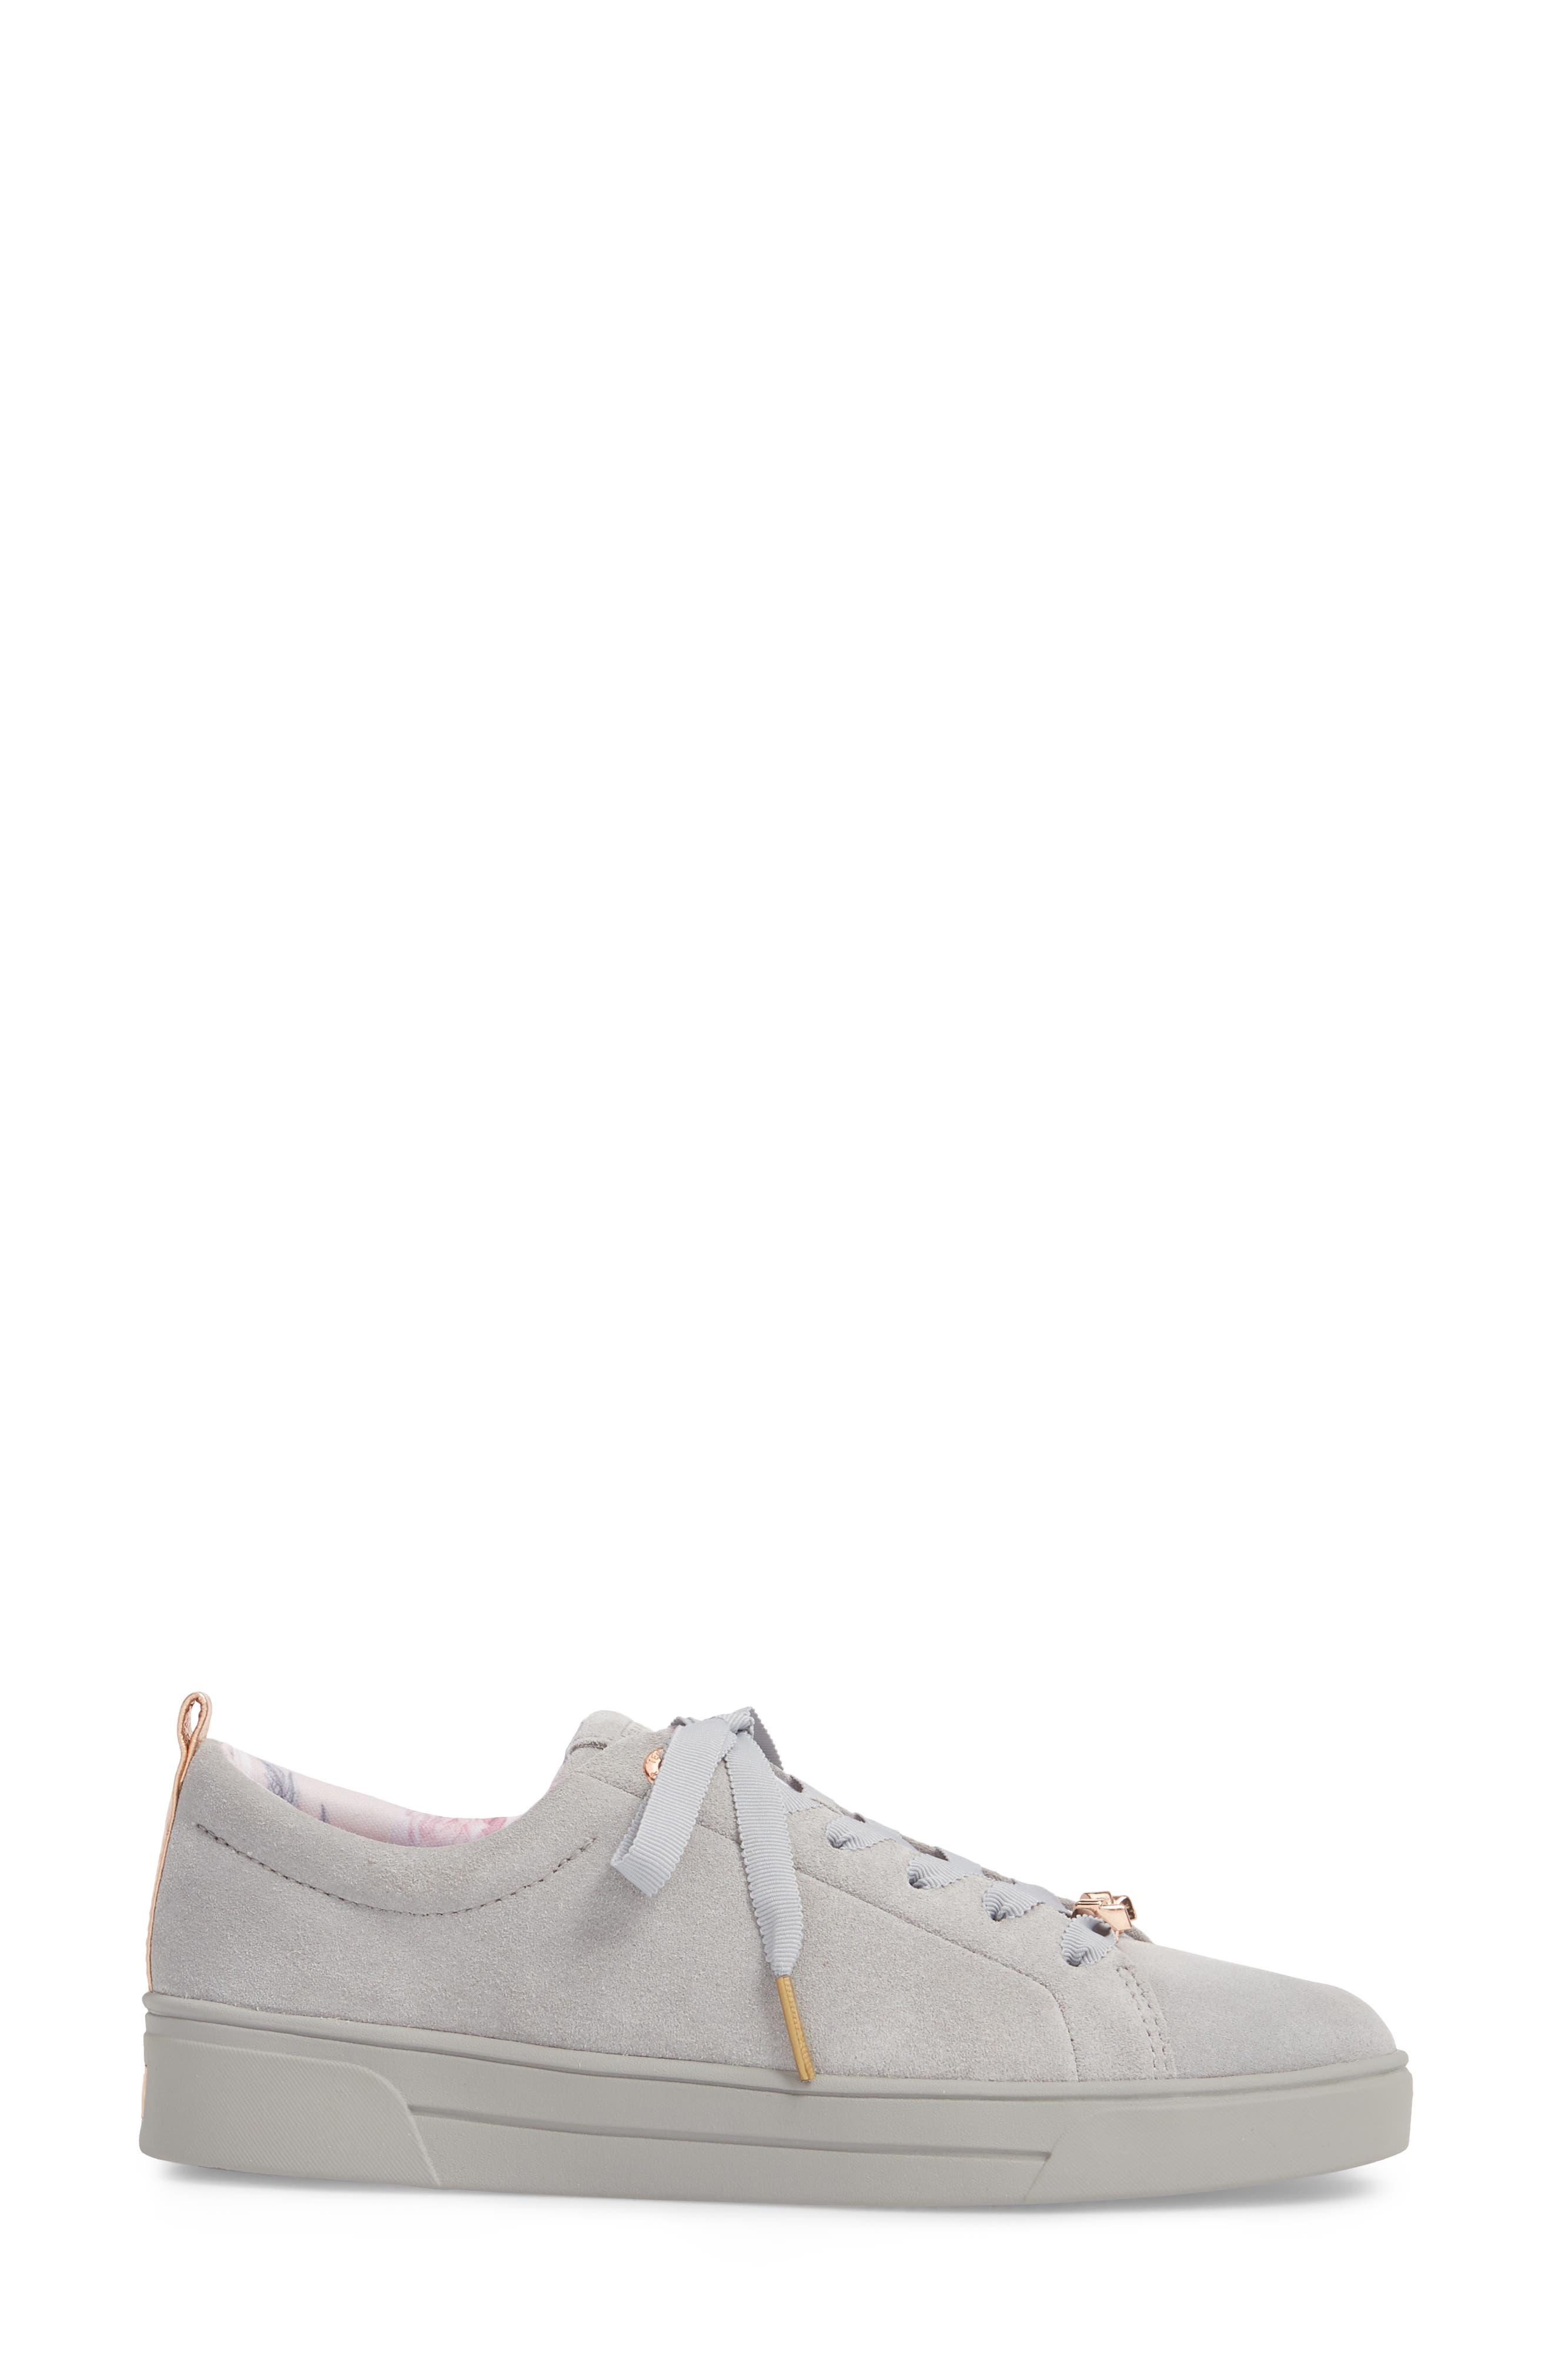 Kelleis Sneaker,                             Alternate thumbnail 3, color,                             052